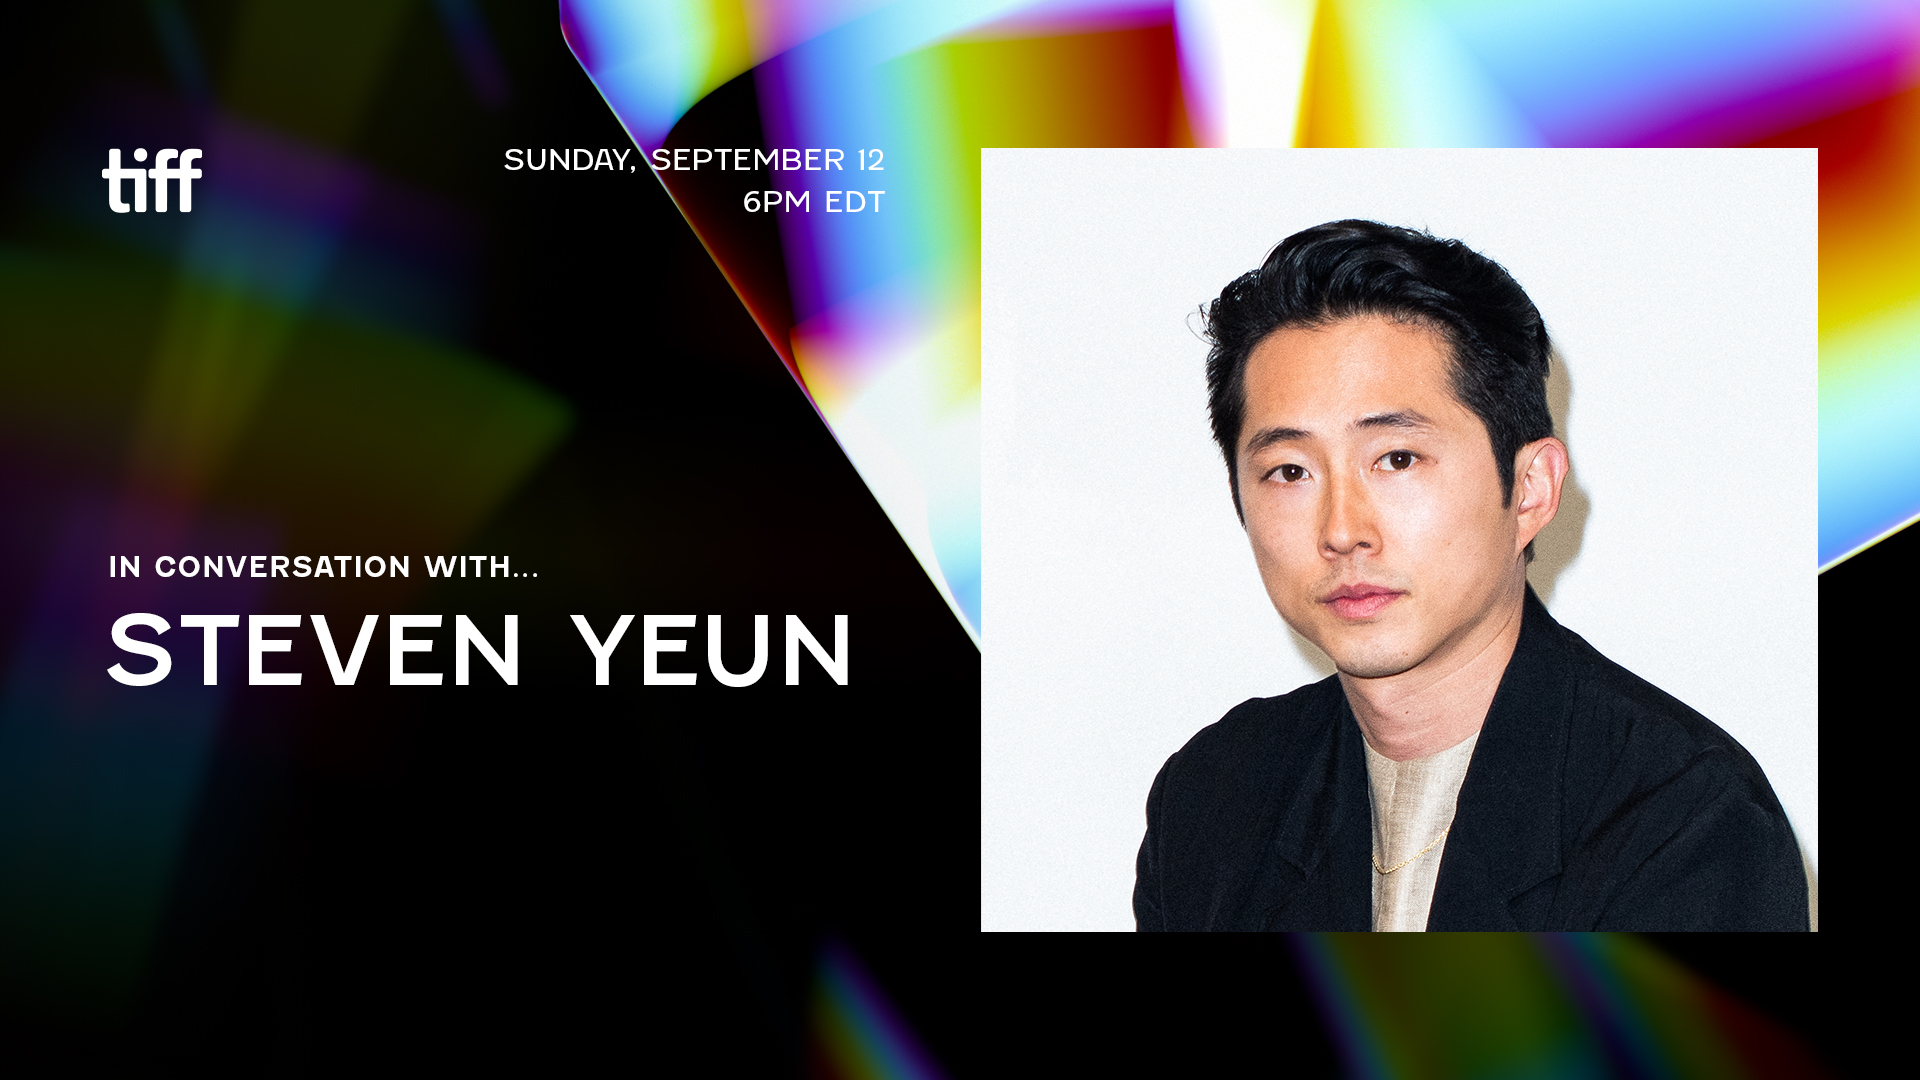 Headshot of Steven Yeun